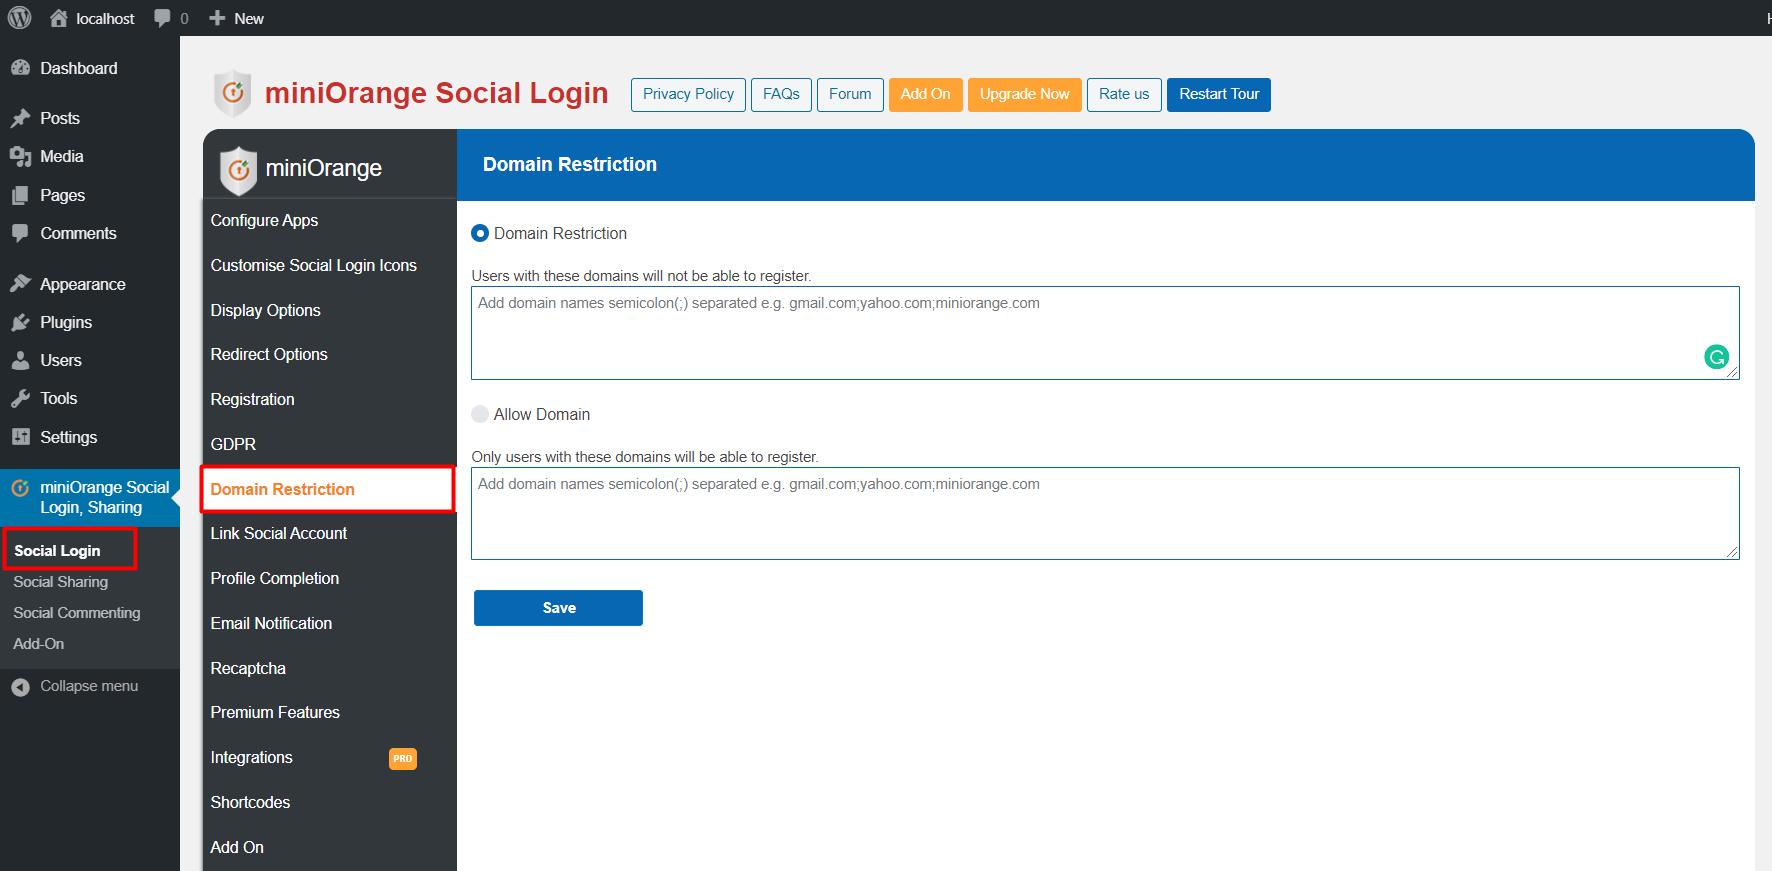 domain restriction Social login on domain Restriction tab